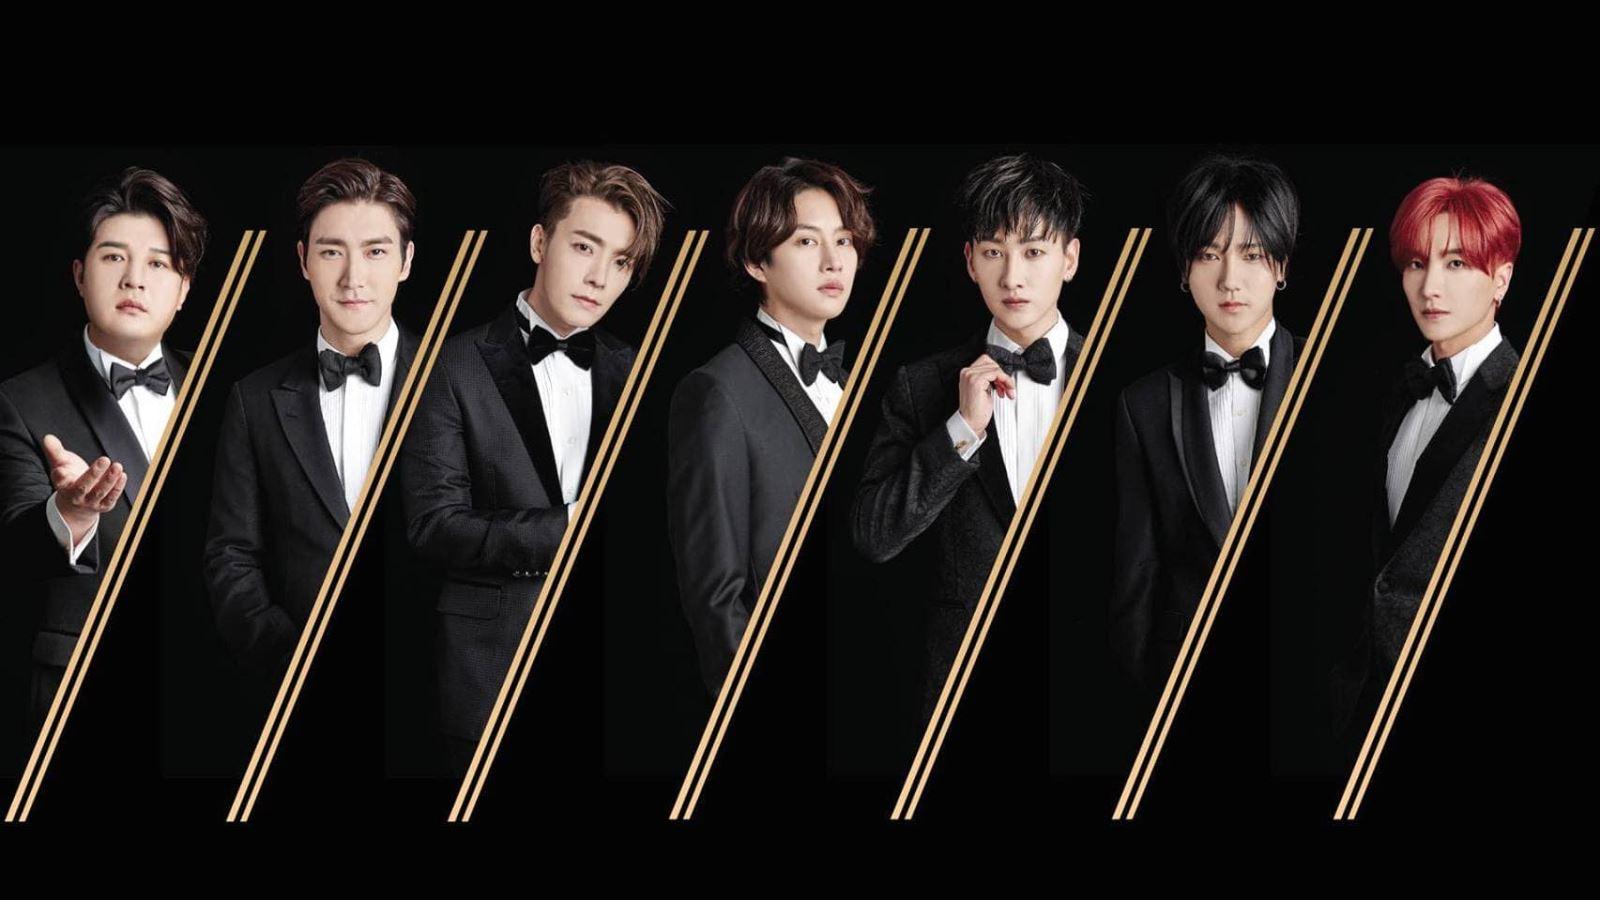 Nhóm nhạc Super Junior